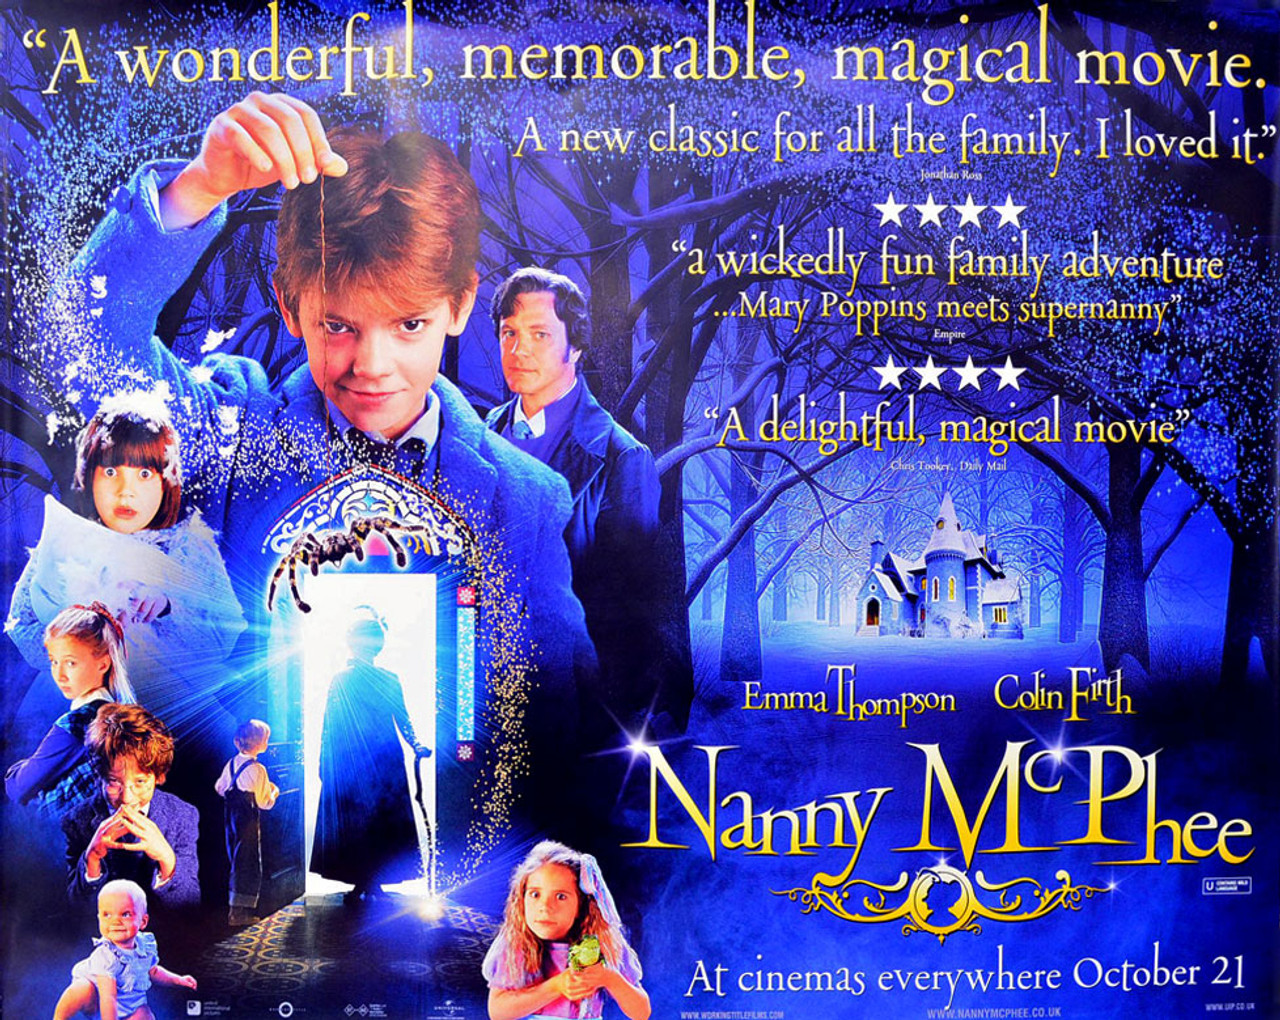 NANNY MCPHEE (SINGLE SIDED) POSTER buy movie posters at Starstills ...